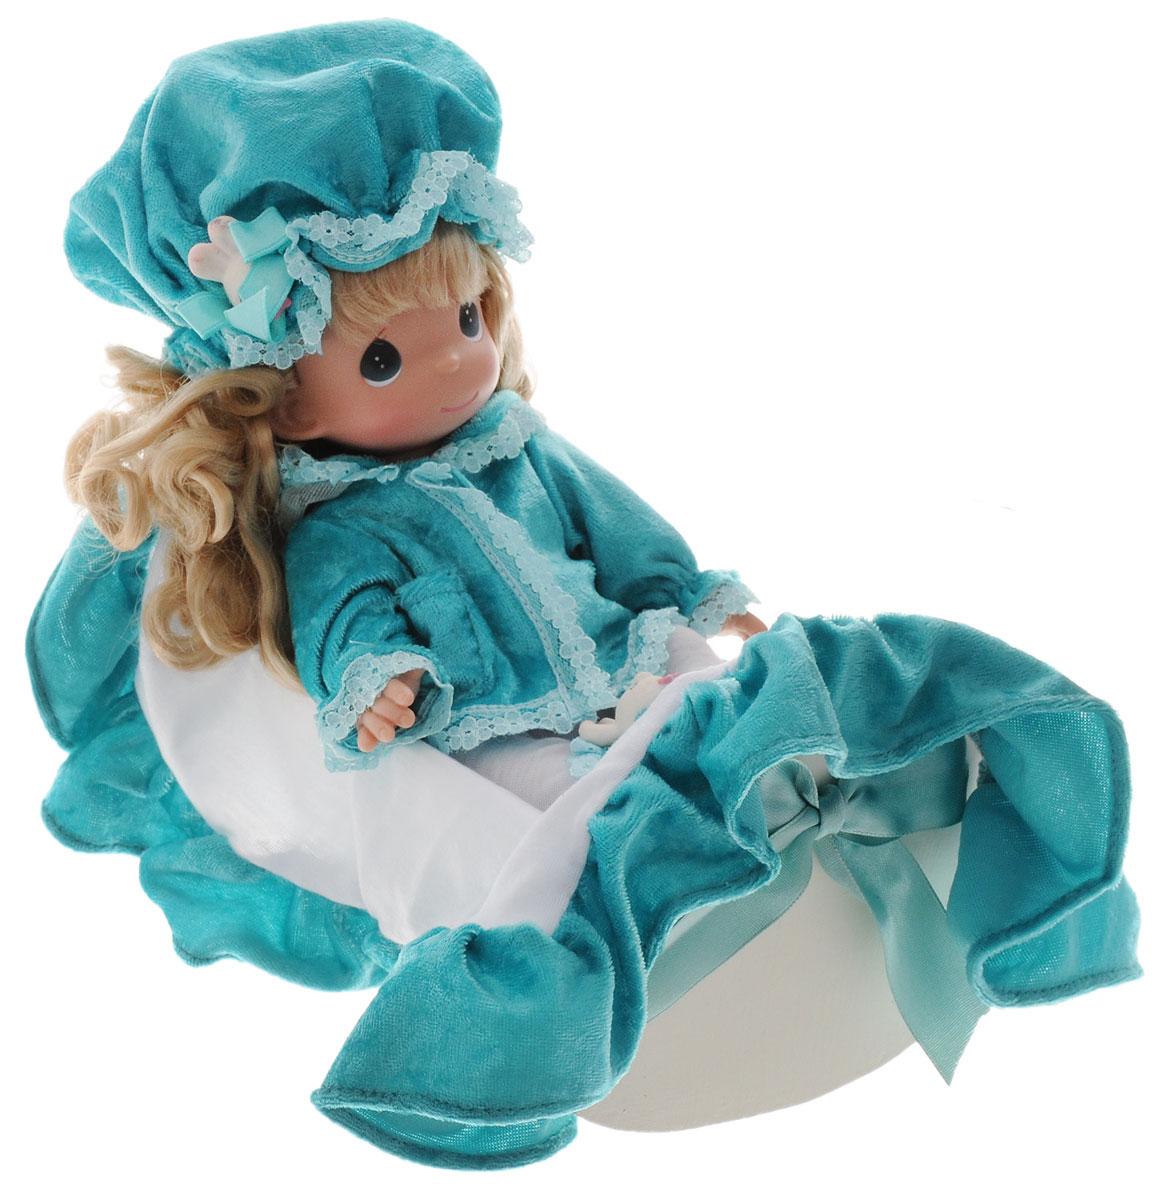 Precious Moments Кукла Рок-бай младенцев девочка куклы и одежда для кукол famosa кукла нэнси волшебный поцелуй